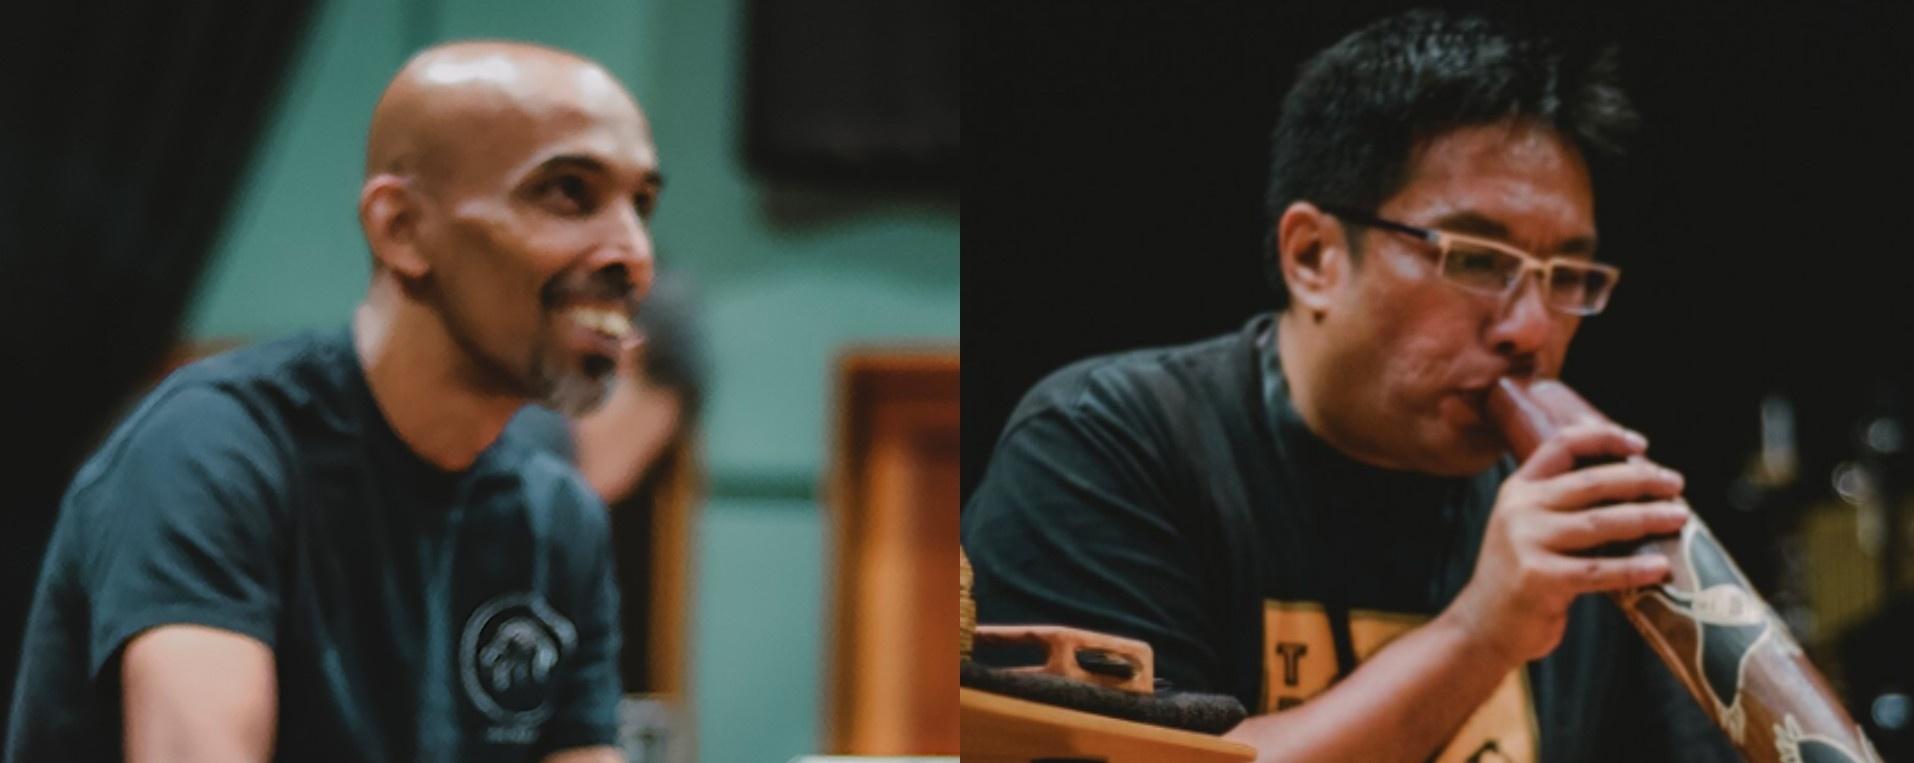 Esplanade Presents: Red Dot August - Listen by Mohamed Noor and Reggie Perera